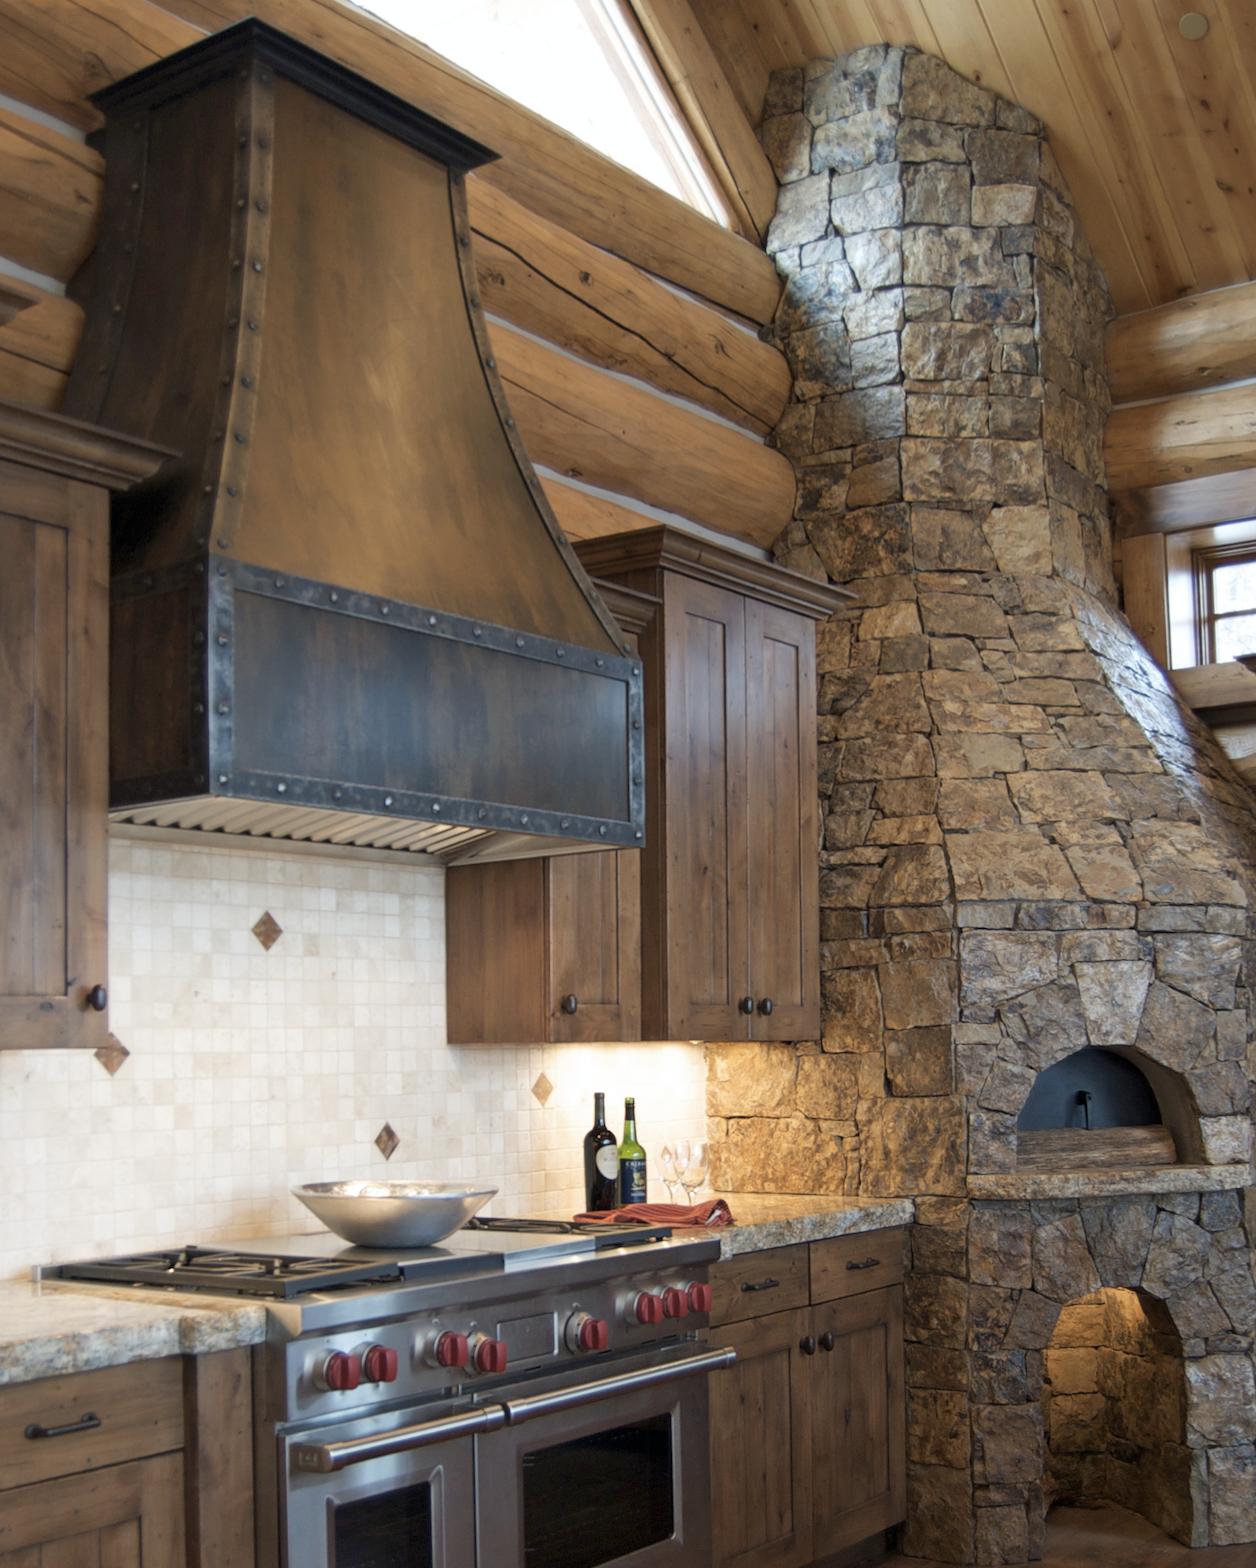 Raw Urth Designs Custom Range Hood Rustic Iron Steel Modern Mountain Home Home Cabin Kitchens